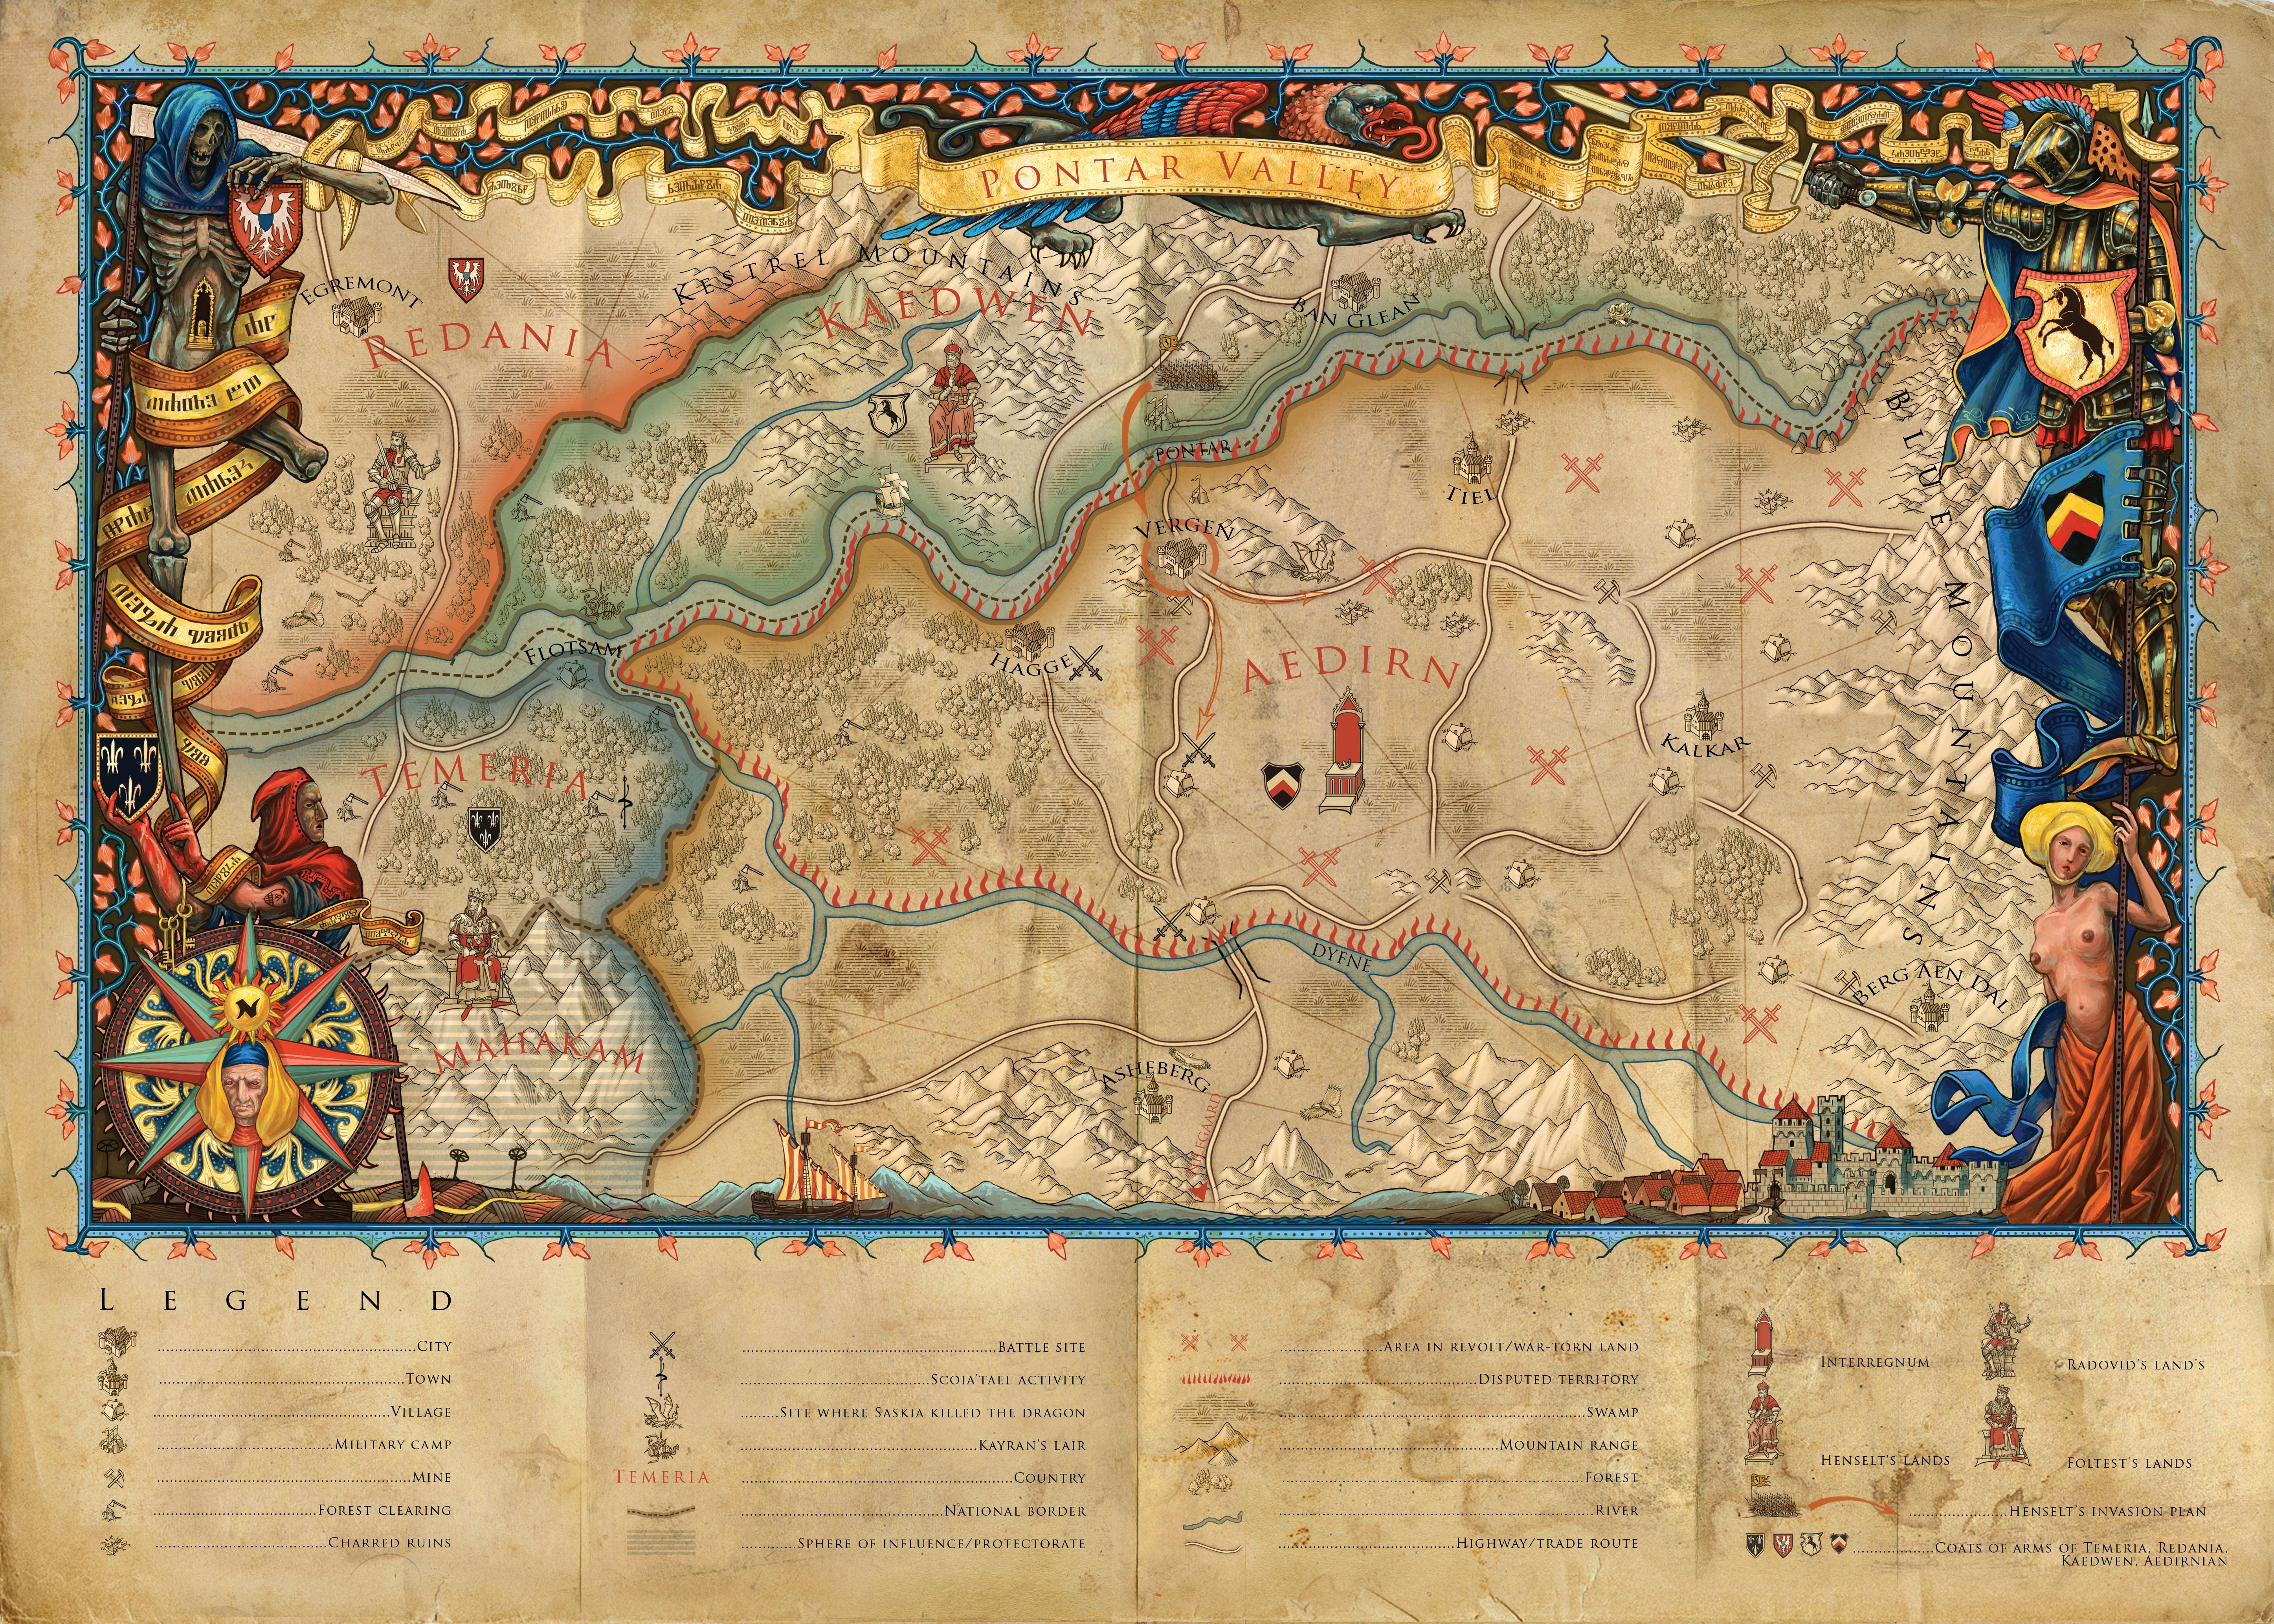 Mappa della Valle del Pontar